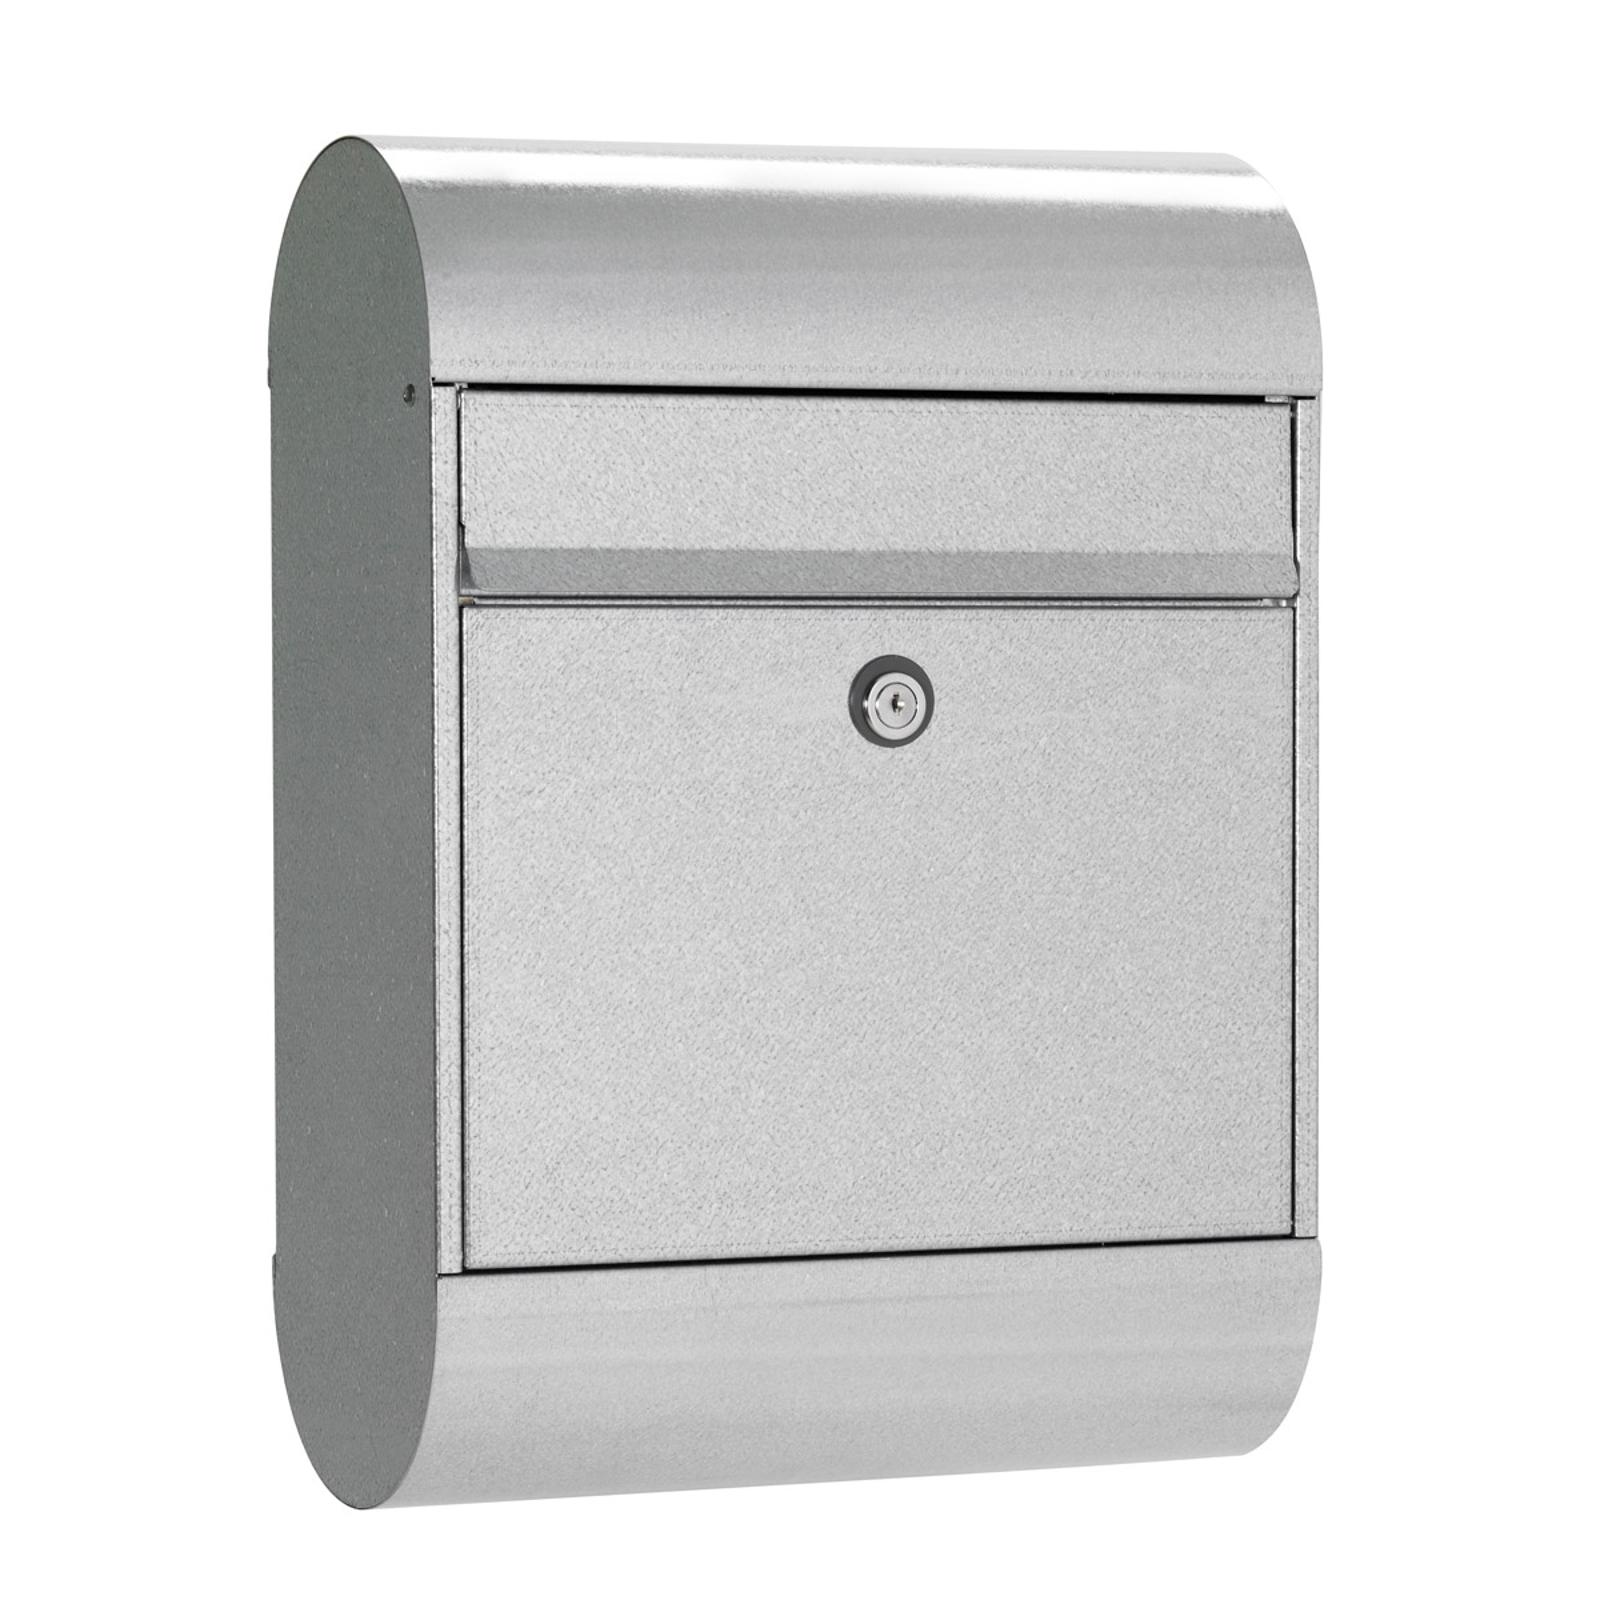 Vacker postlåda 6000, stål